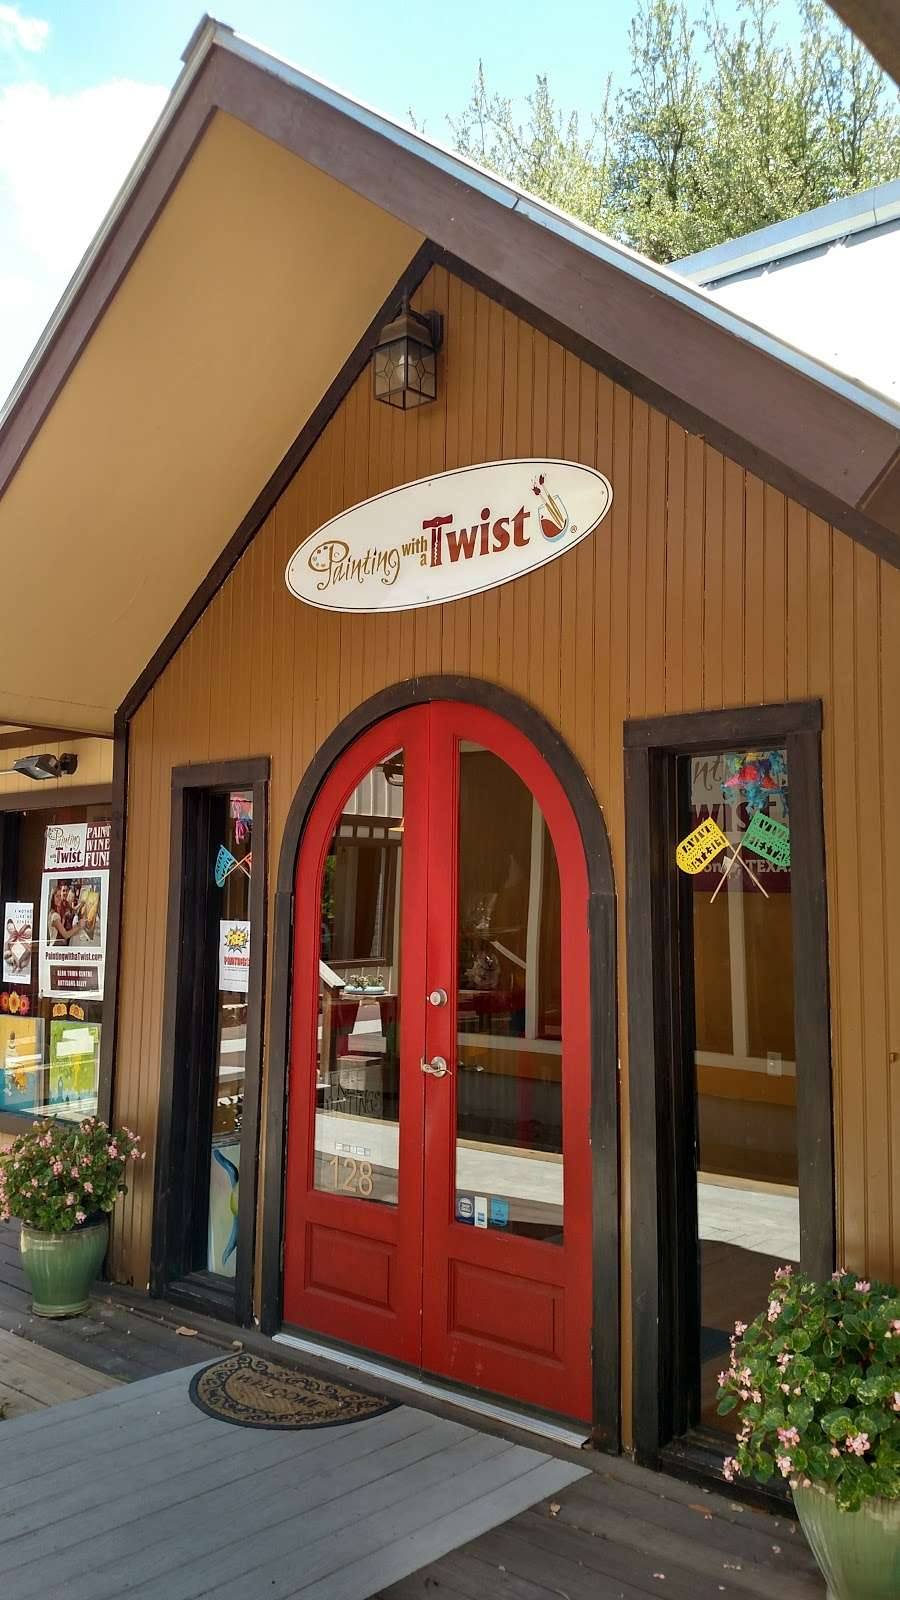 The Bread Box - cafe  | Photo 3 of 10 | Address: 555 W Bitters Rd #115, San Antonio, TX 78216, USA | Phone: (210) 277-8612